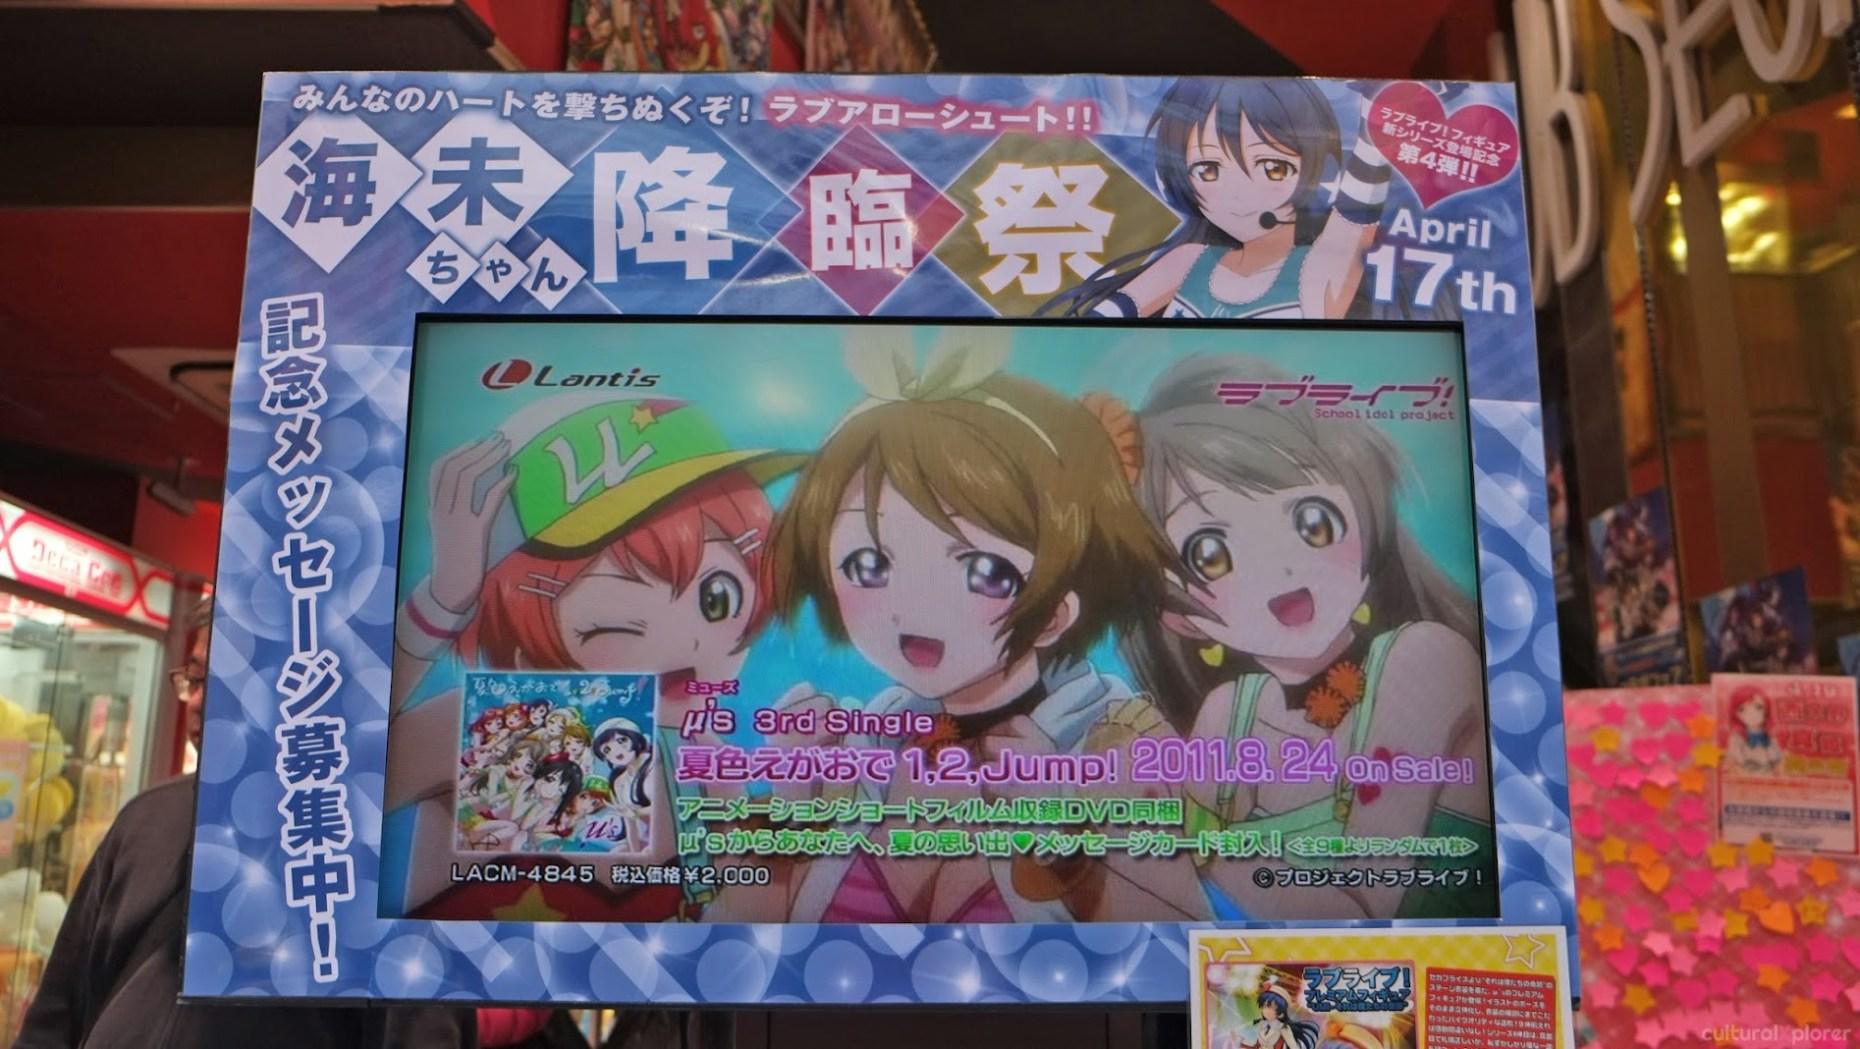 Anime Akihabara